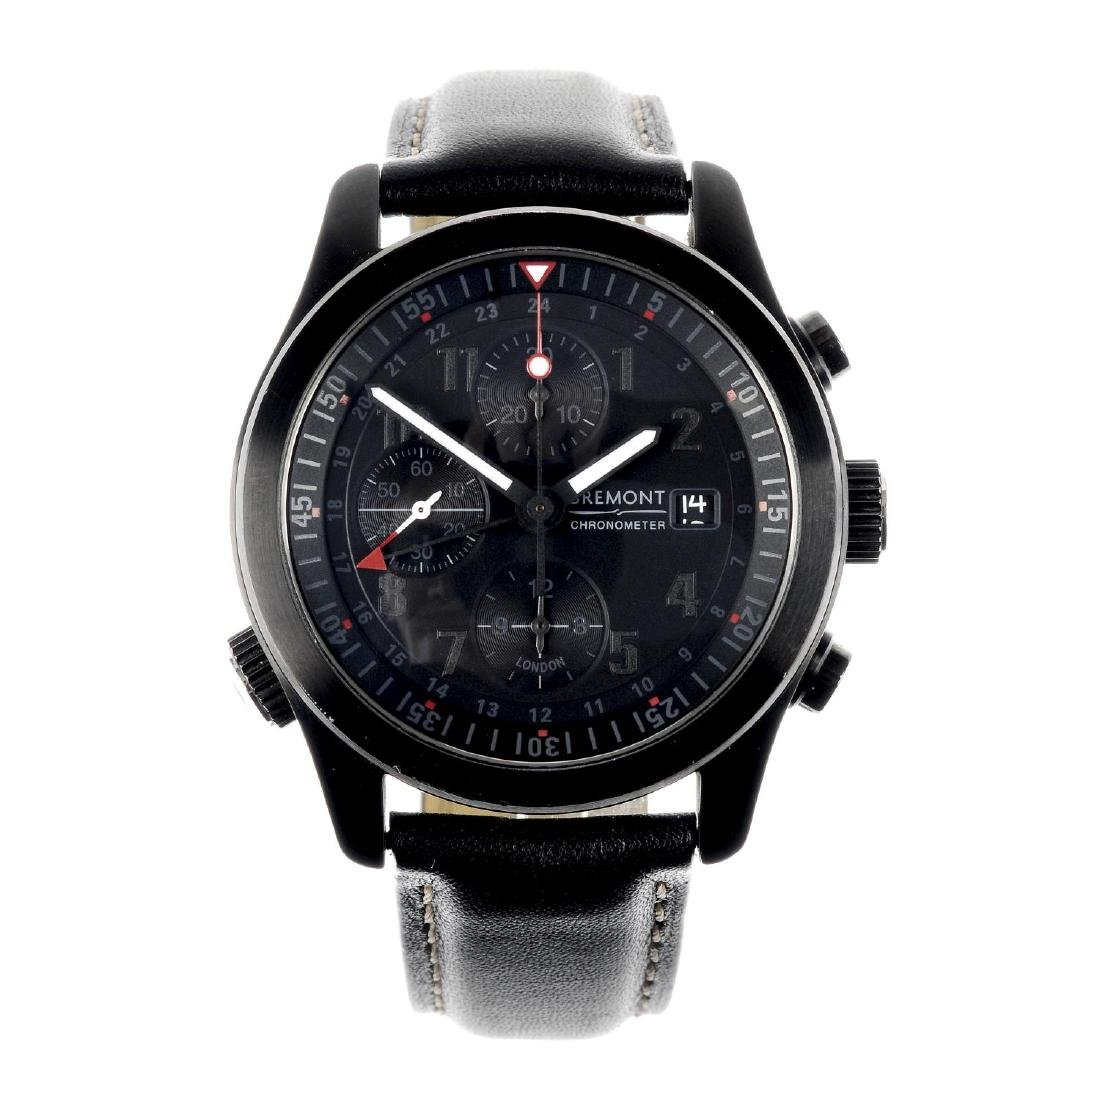 BREMONT - a gentleman's GMT chronograph wrist watch.